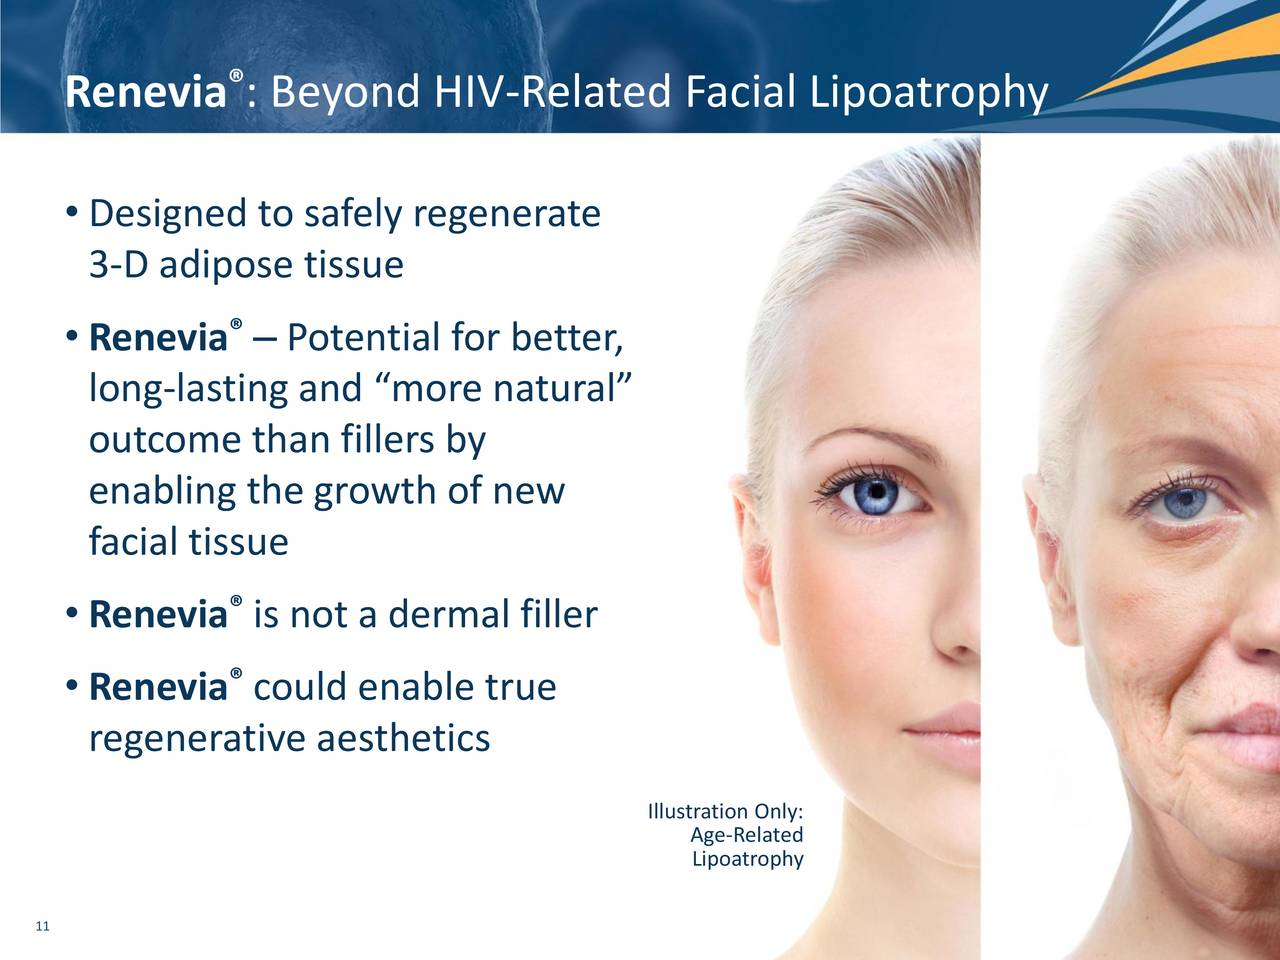 Lipoatrophy of facial